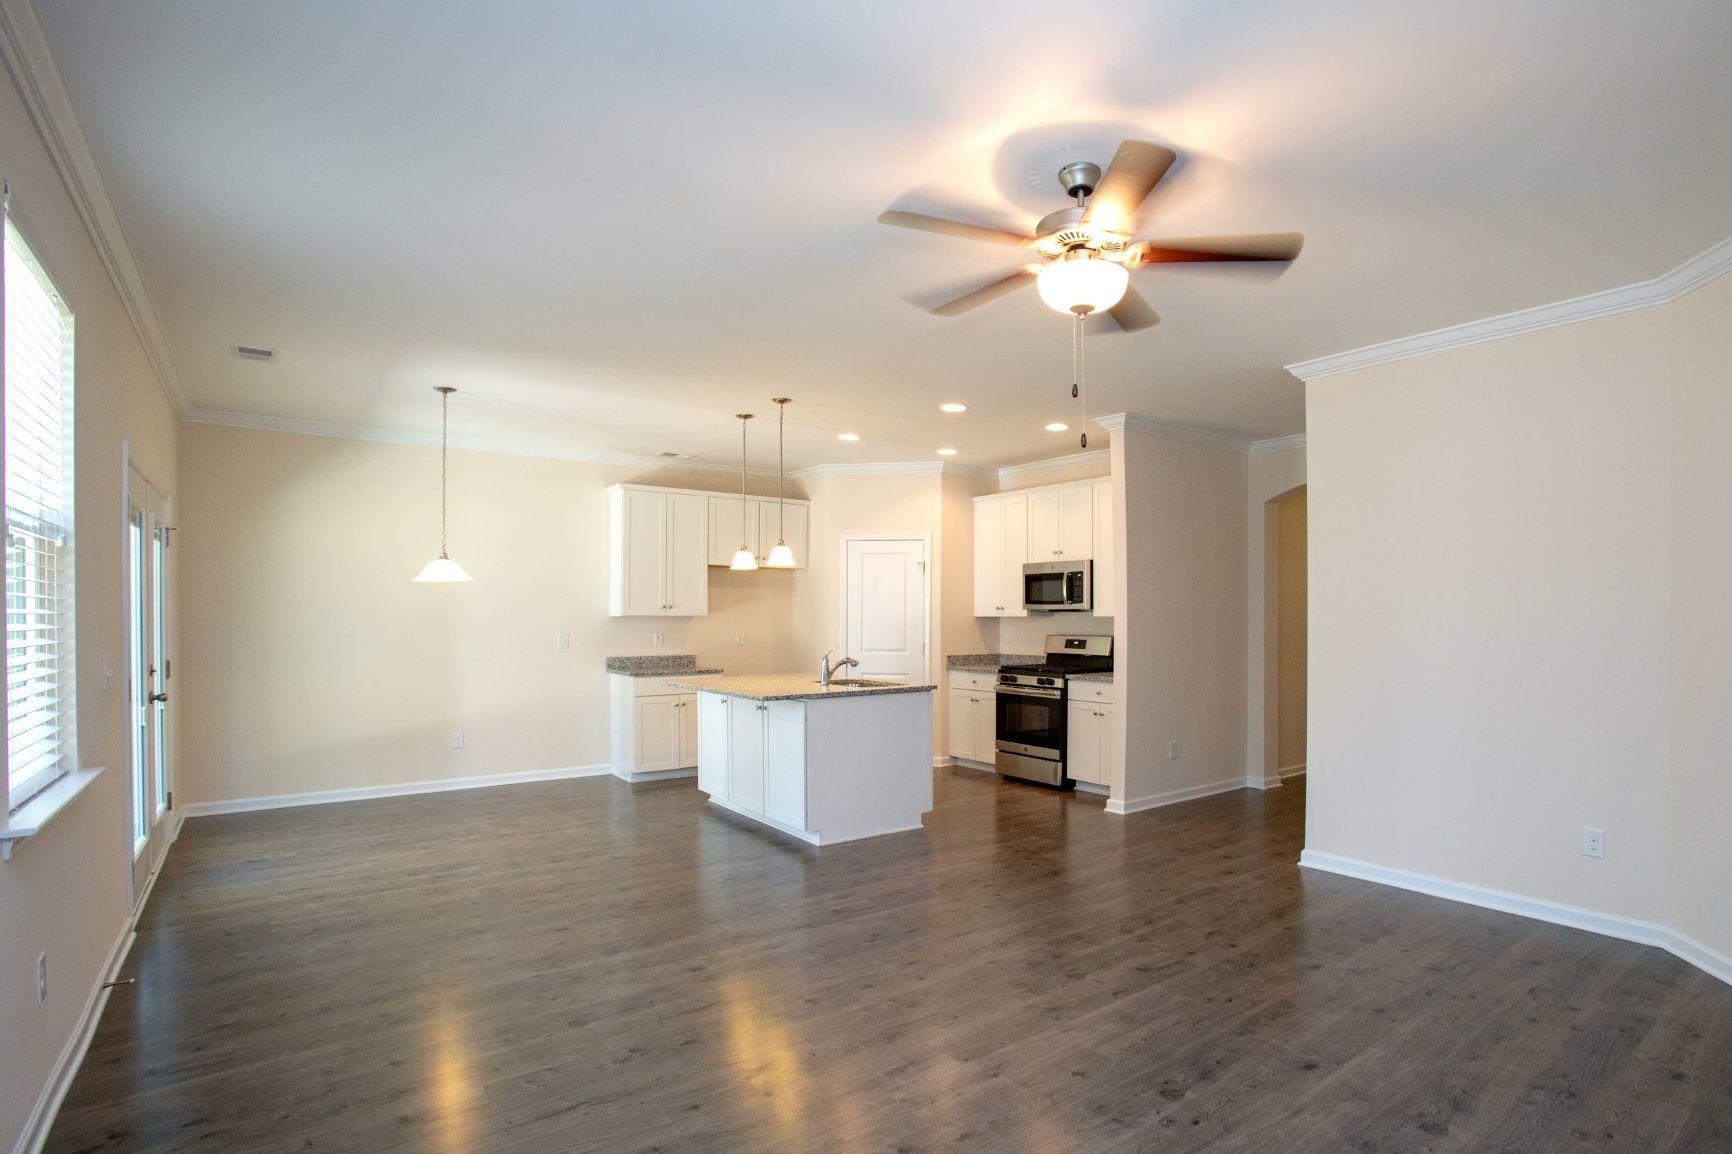 Chapel Creek Plantation Homes For Sale - 127 Birdie, Santee, SC - 2